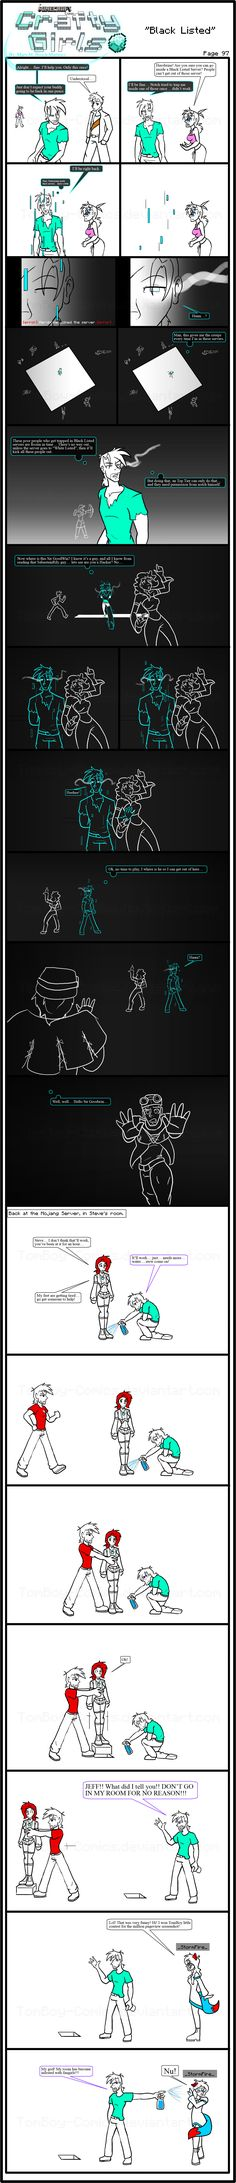 Minecraft Comic: CraftyGirls Pg 97 by TomBoy-Comics on DeviantArt